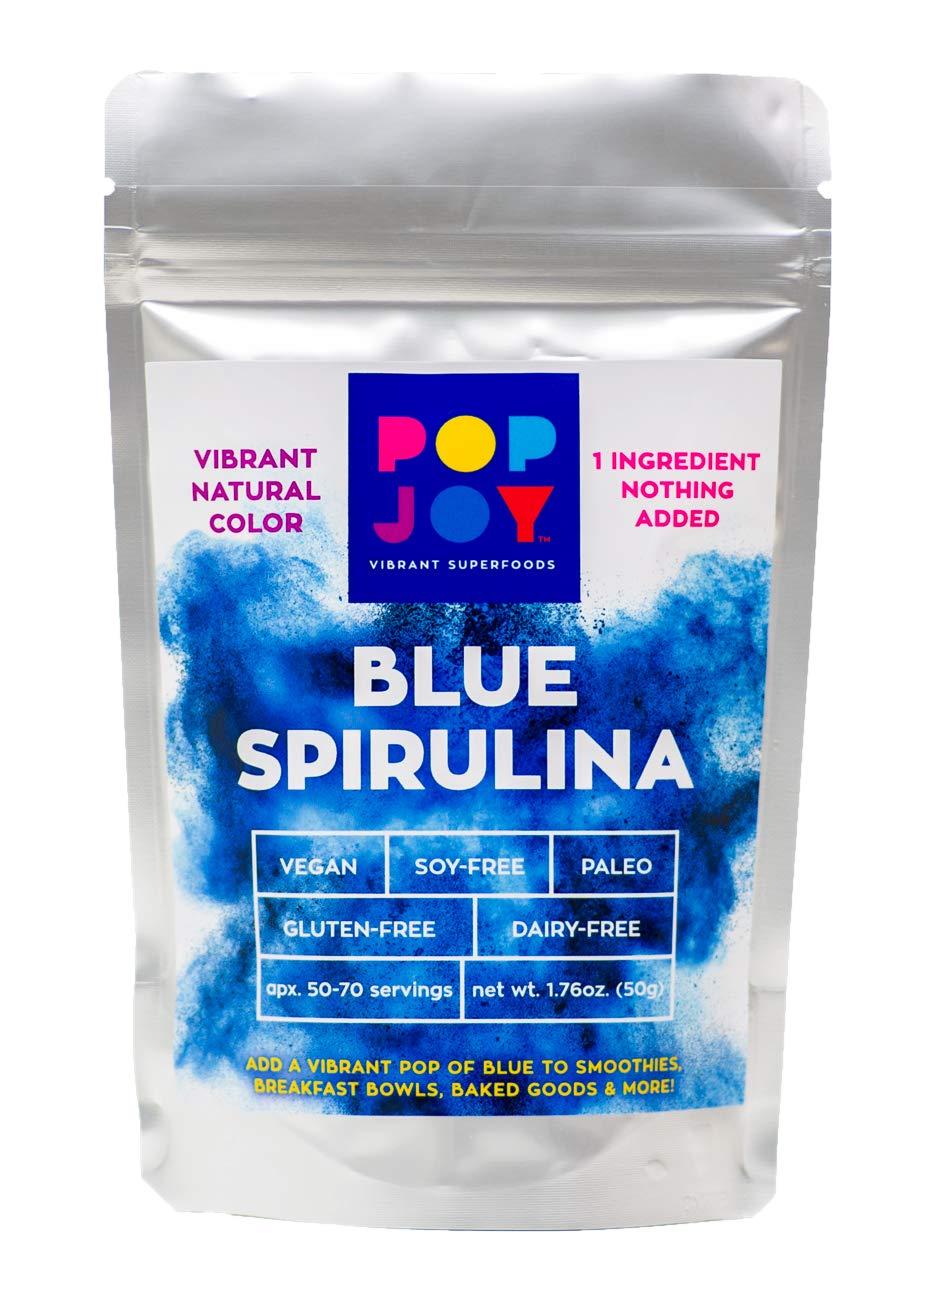 100% Blue SPIRULINA Powder by POPJOY - Vibrant SUPERFOODS